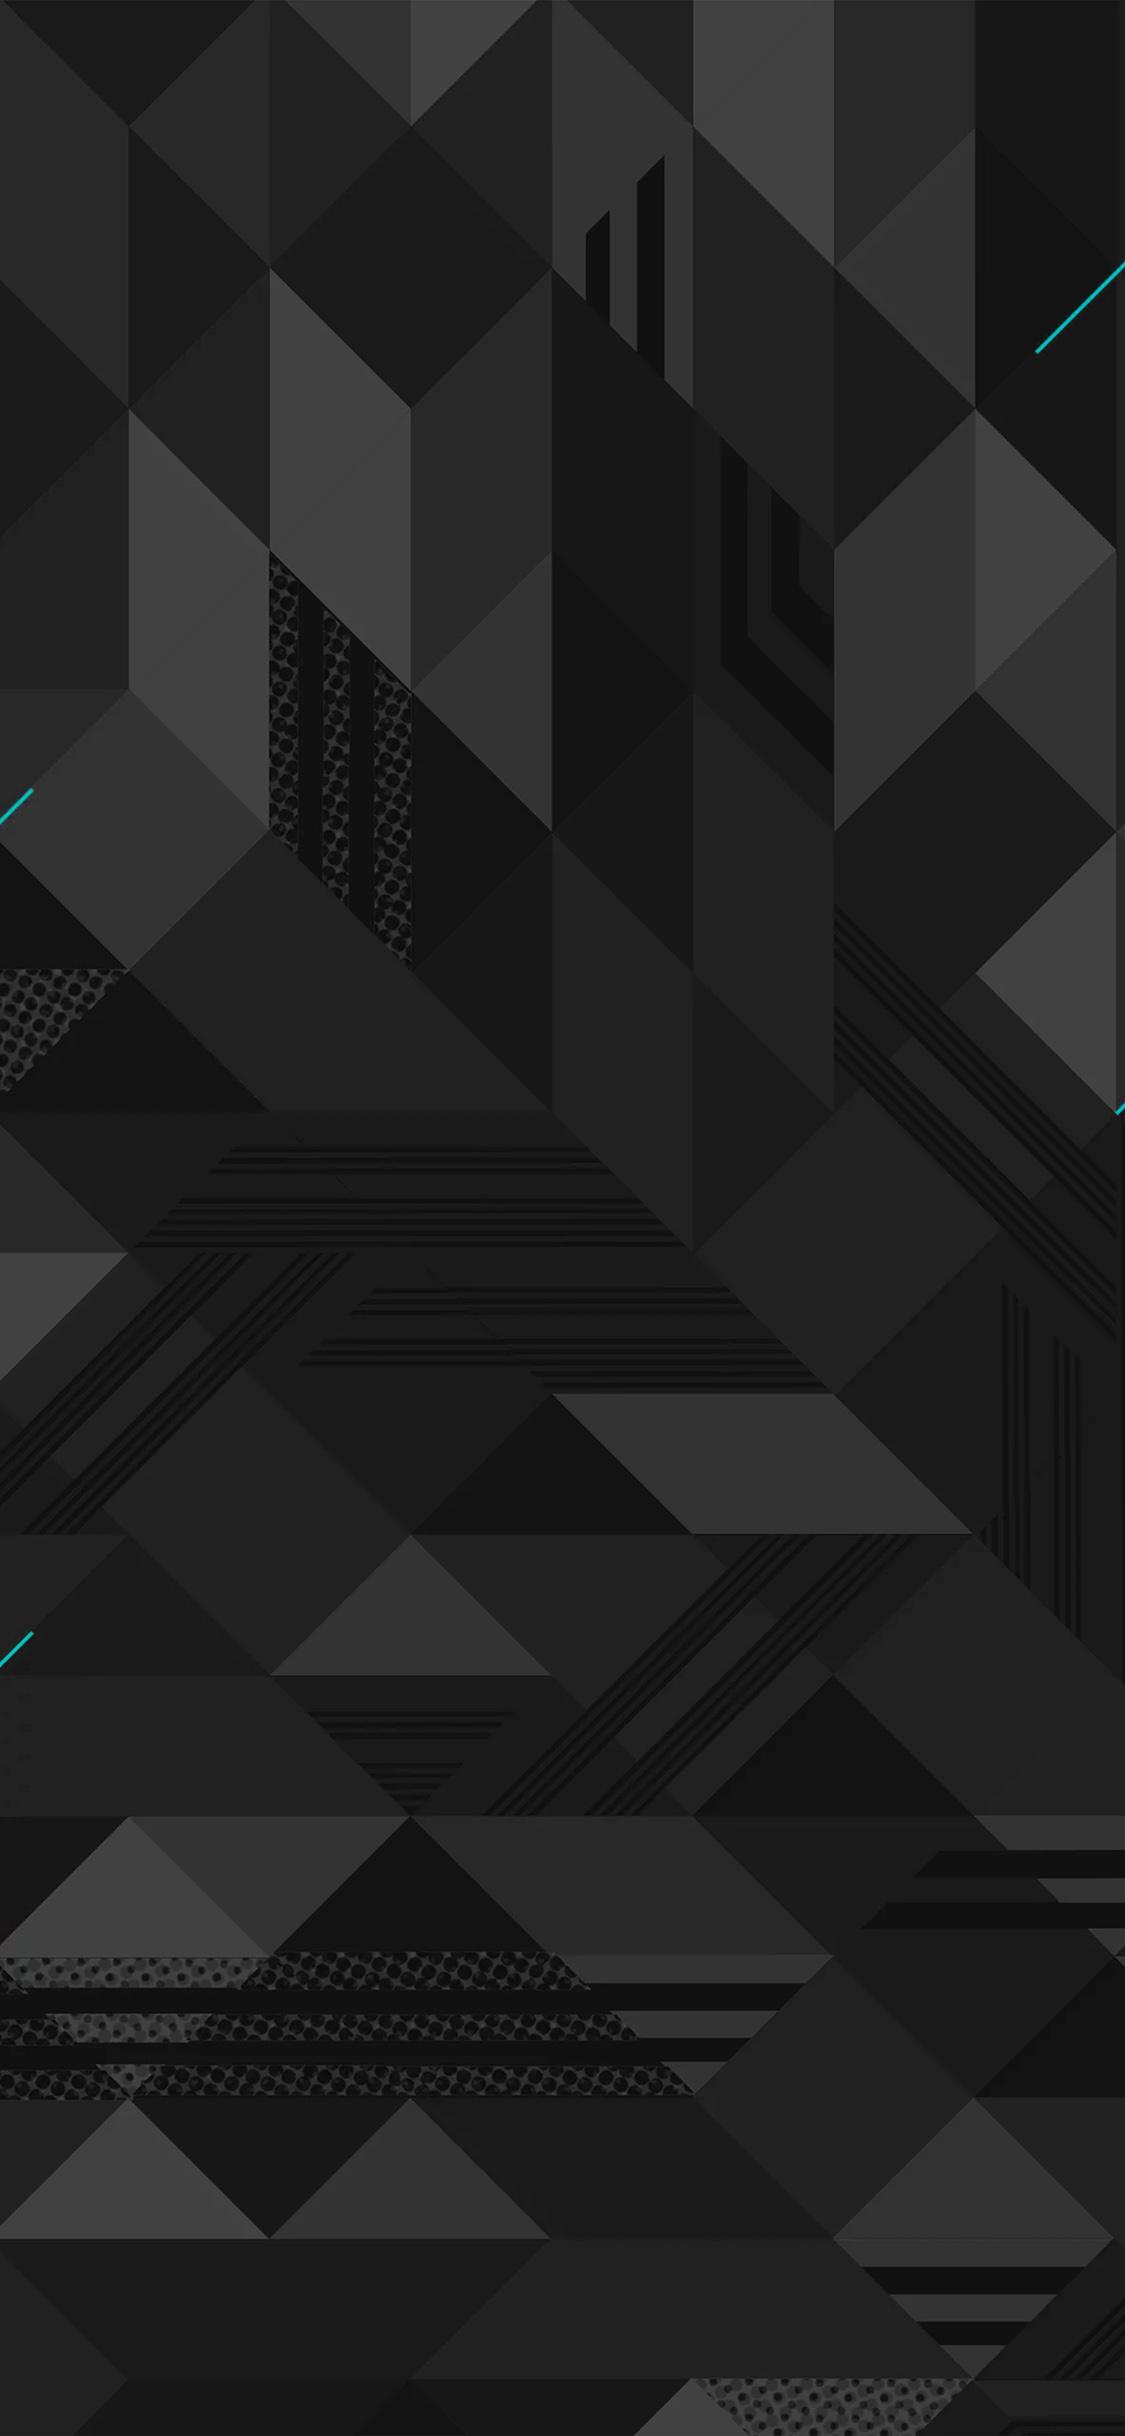 iPhoneXpapers.com-Apple-iPhone-wallpaper-vn71-galaxy-s7-dark-blue-pattern